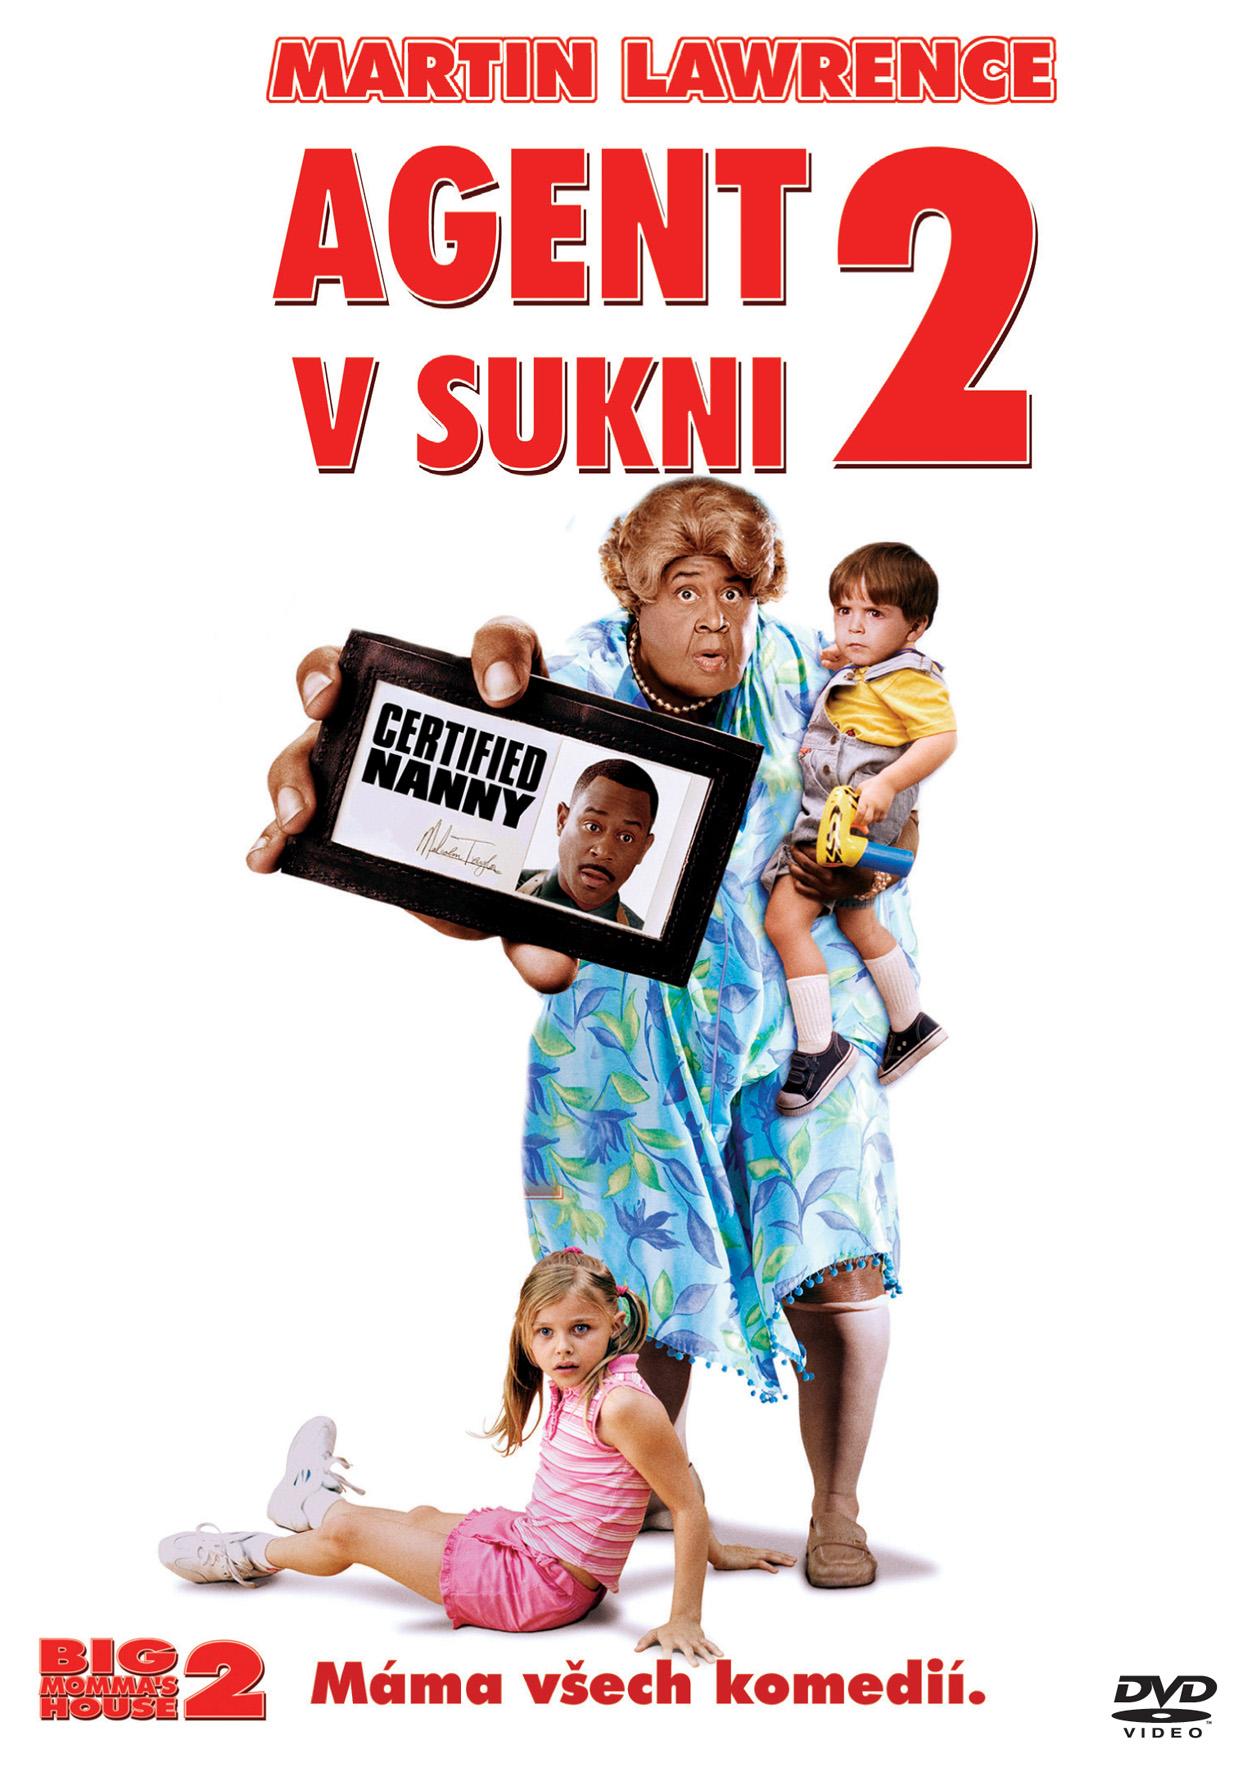 Agent v sukni 2 HD (2006)